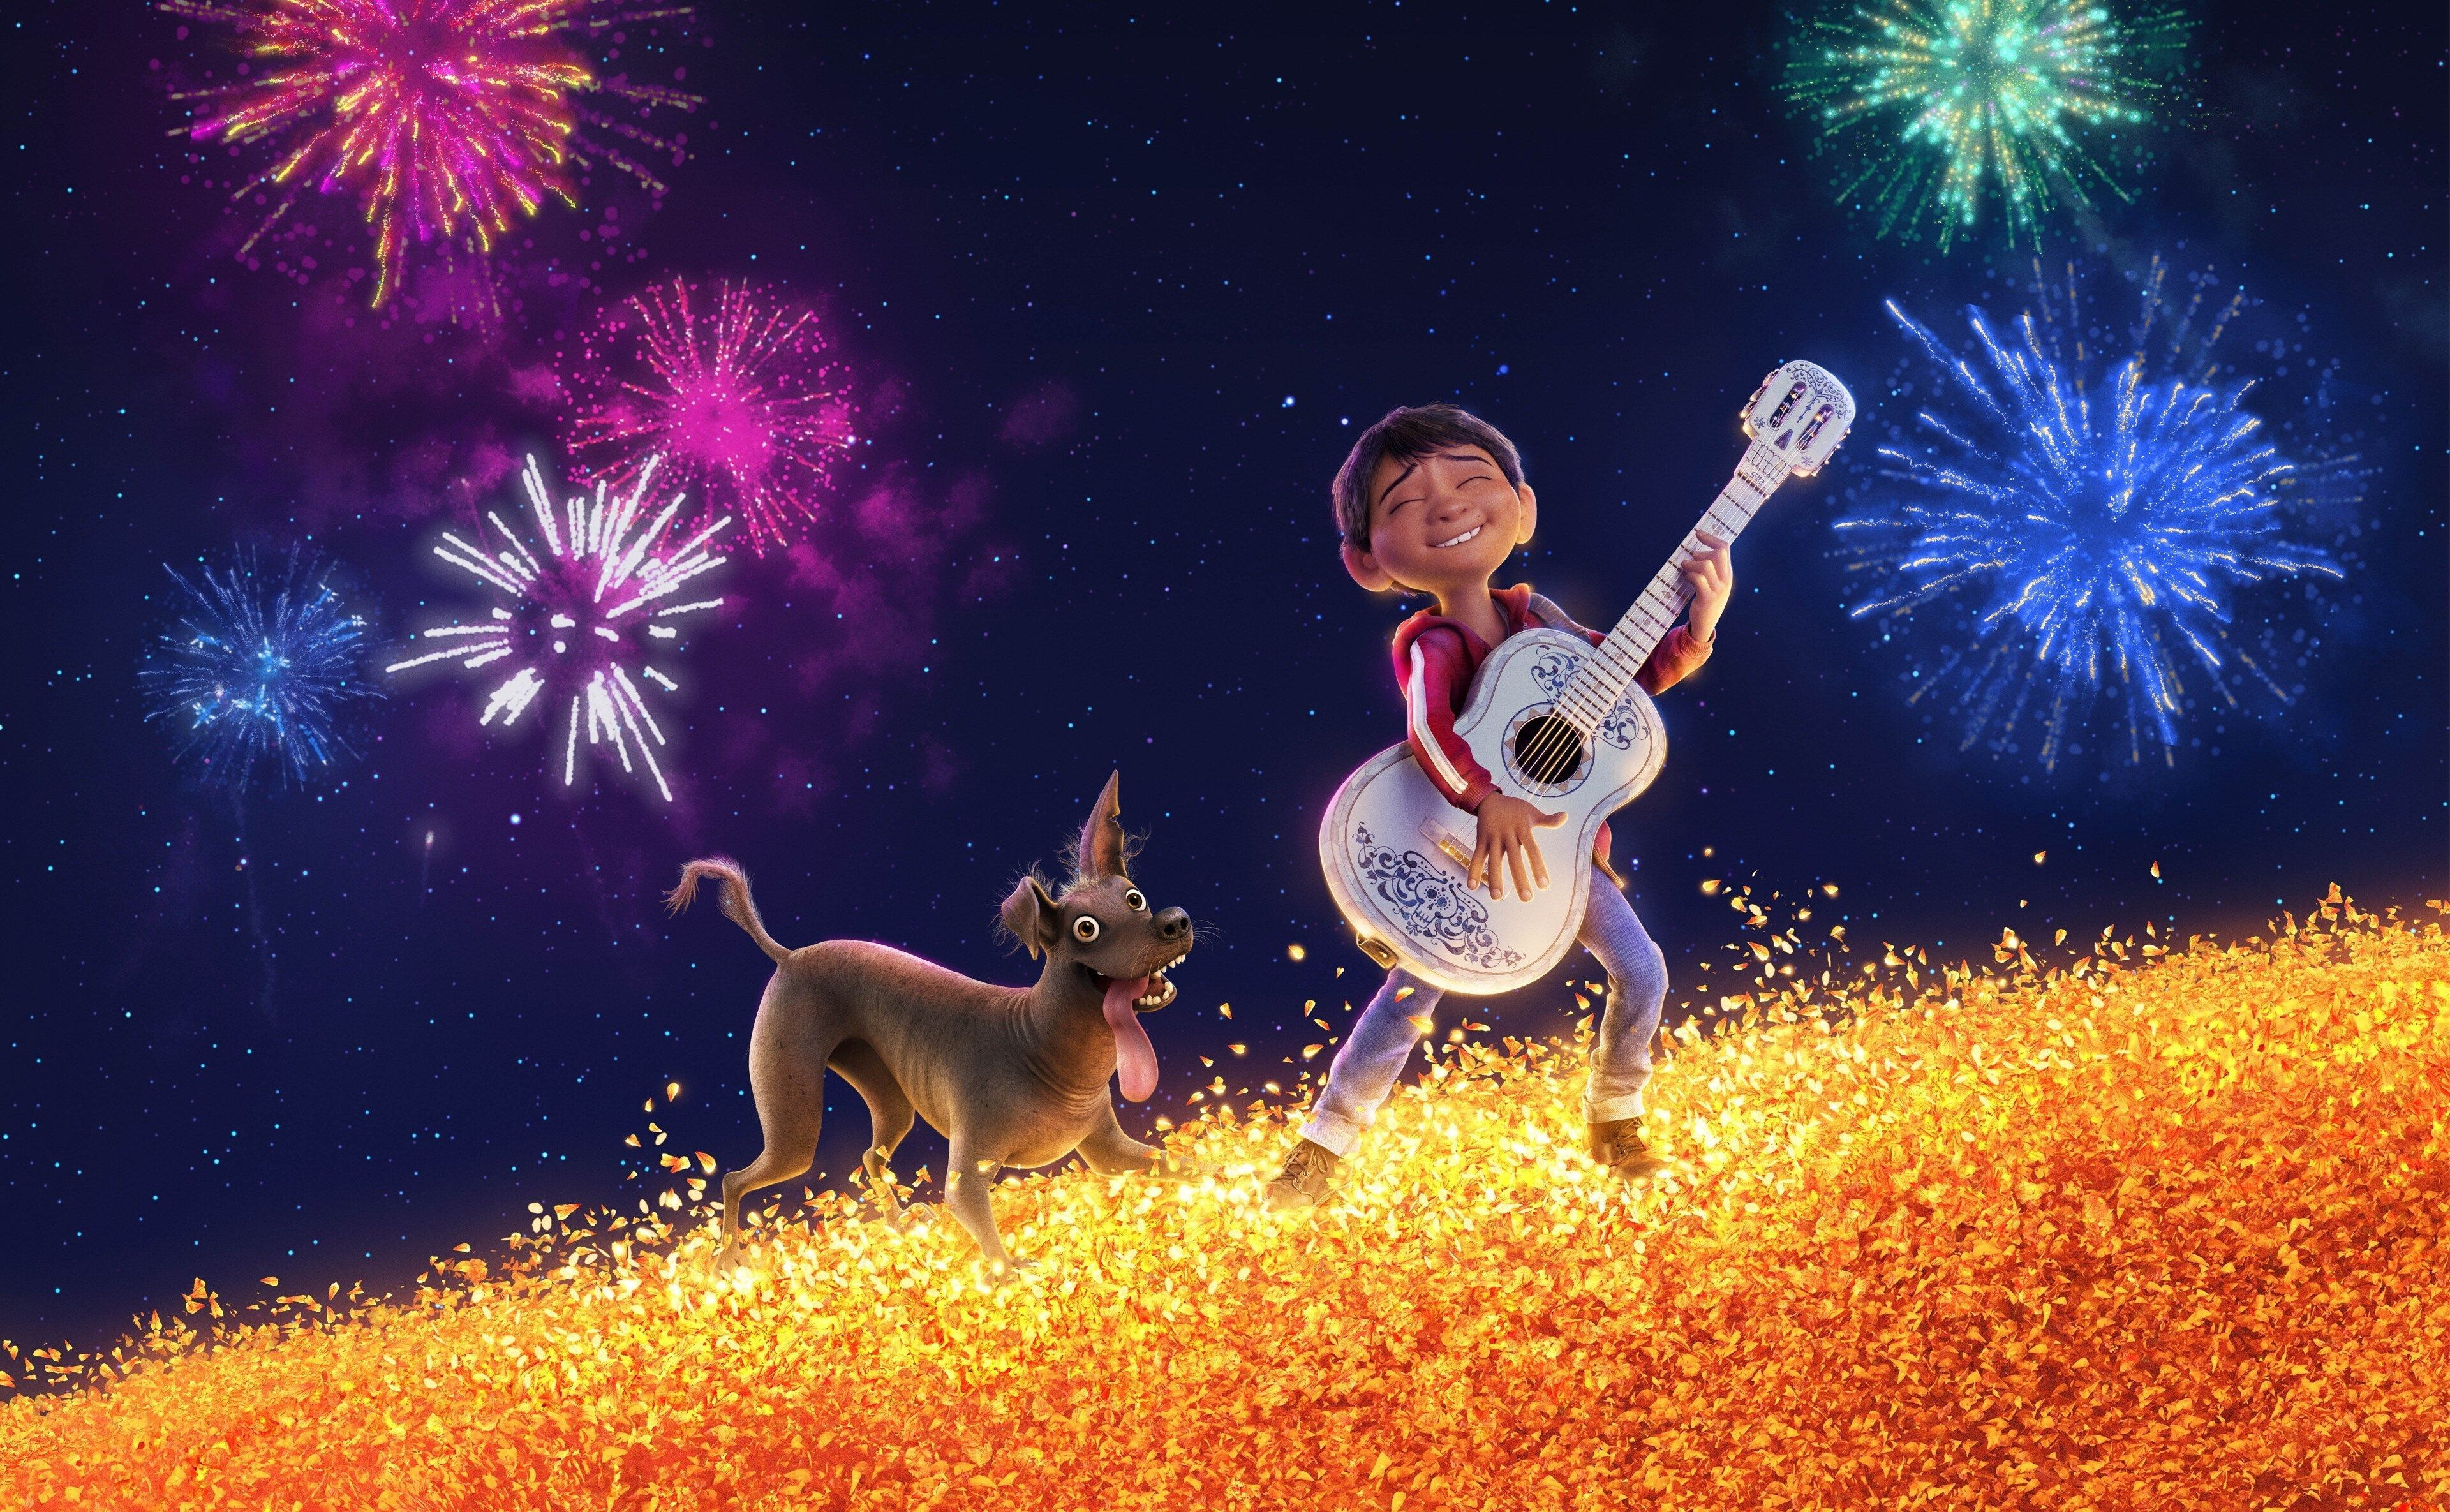 Disney Pixar 4k Wallpapers Top Free Disney Pixar 4k Backgrounds Wallpaperaccess